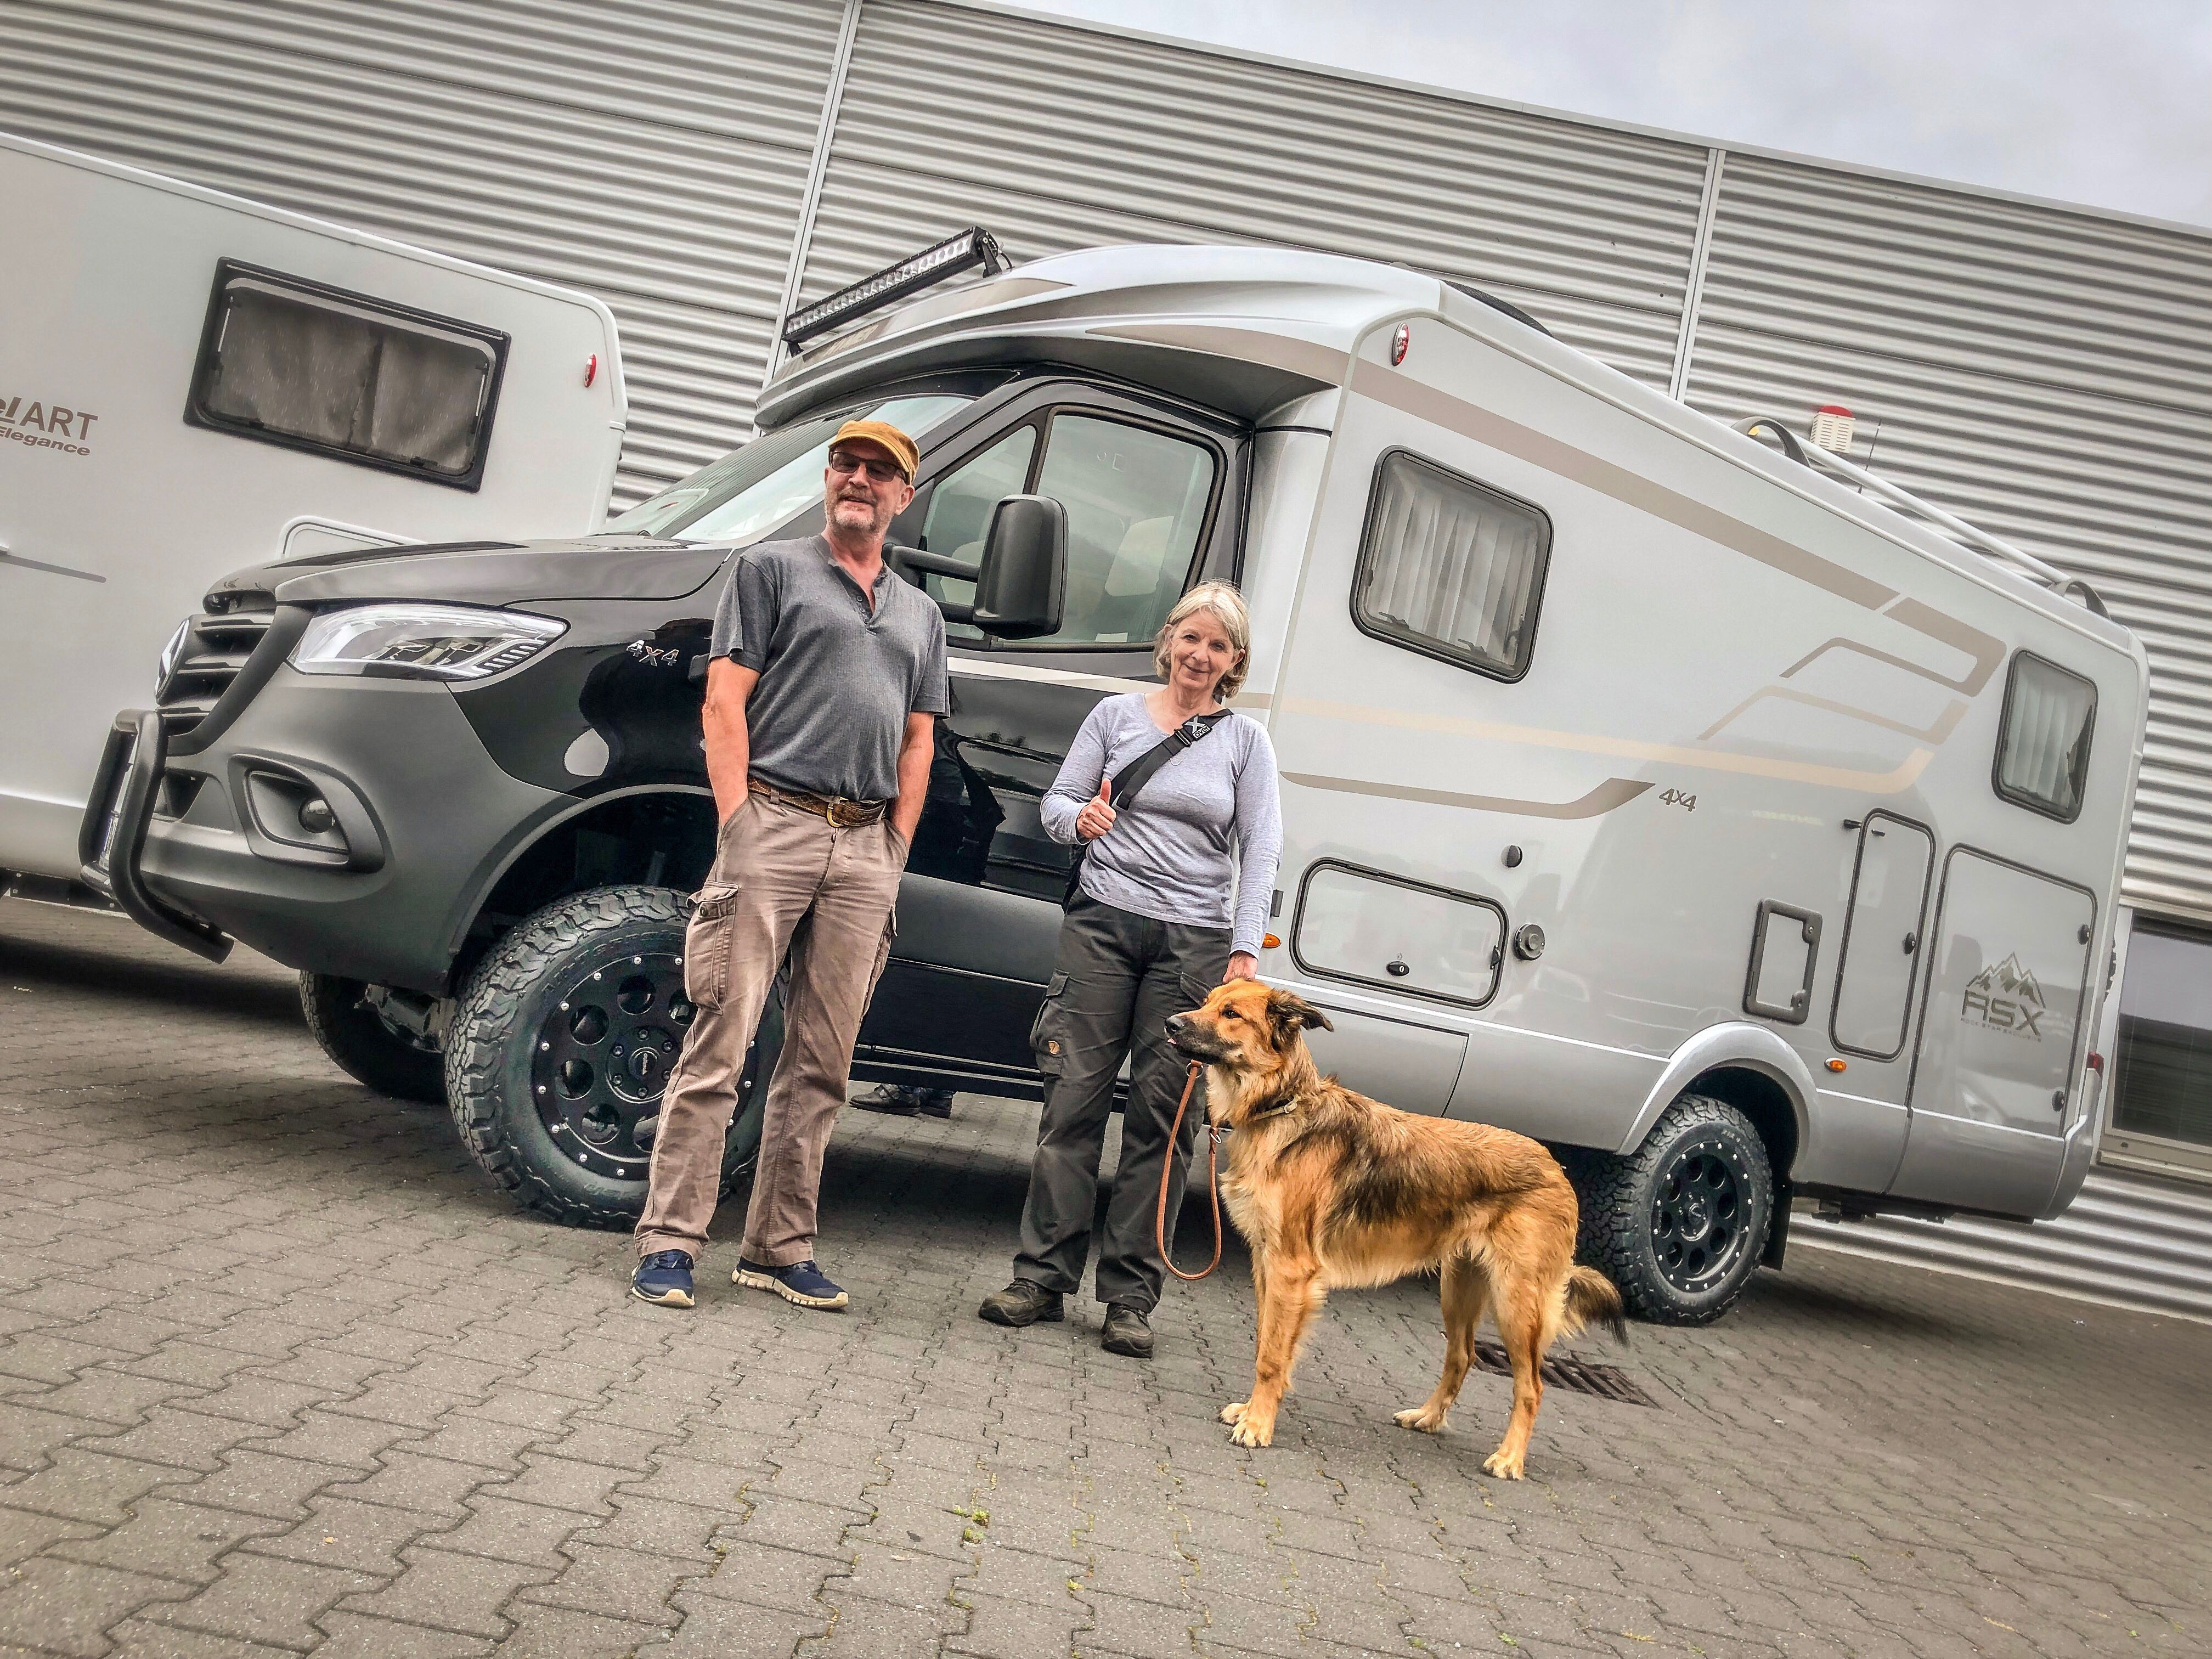 Couple with dog  Reisemobil, Caravan, Wohnmobil